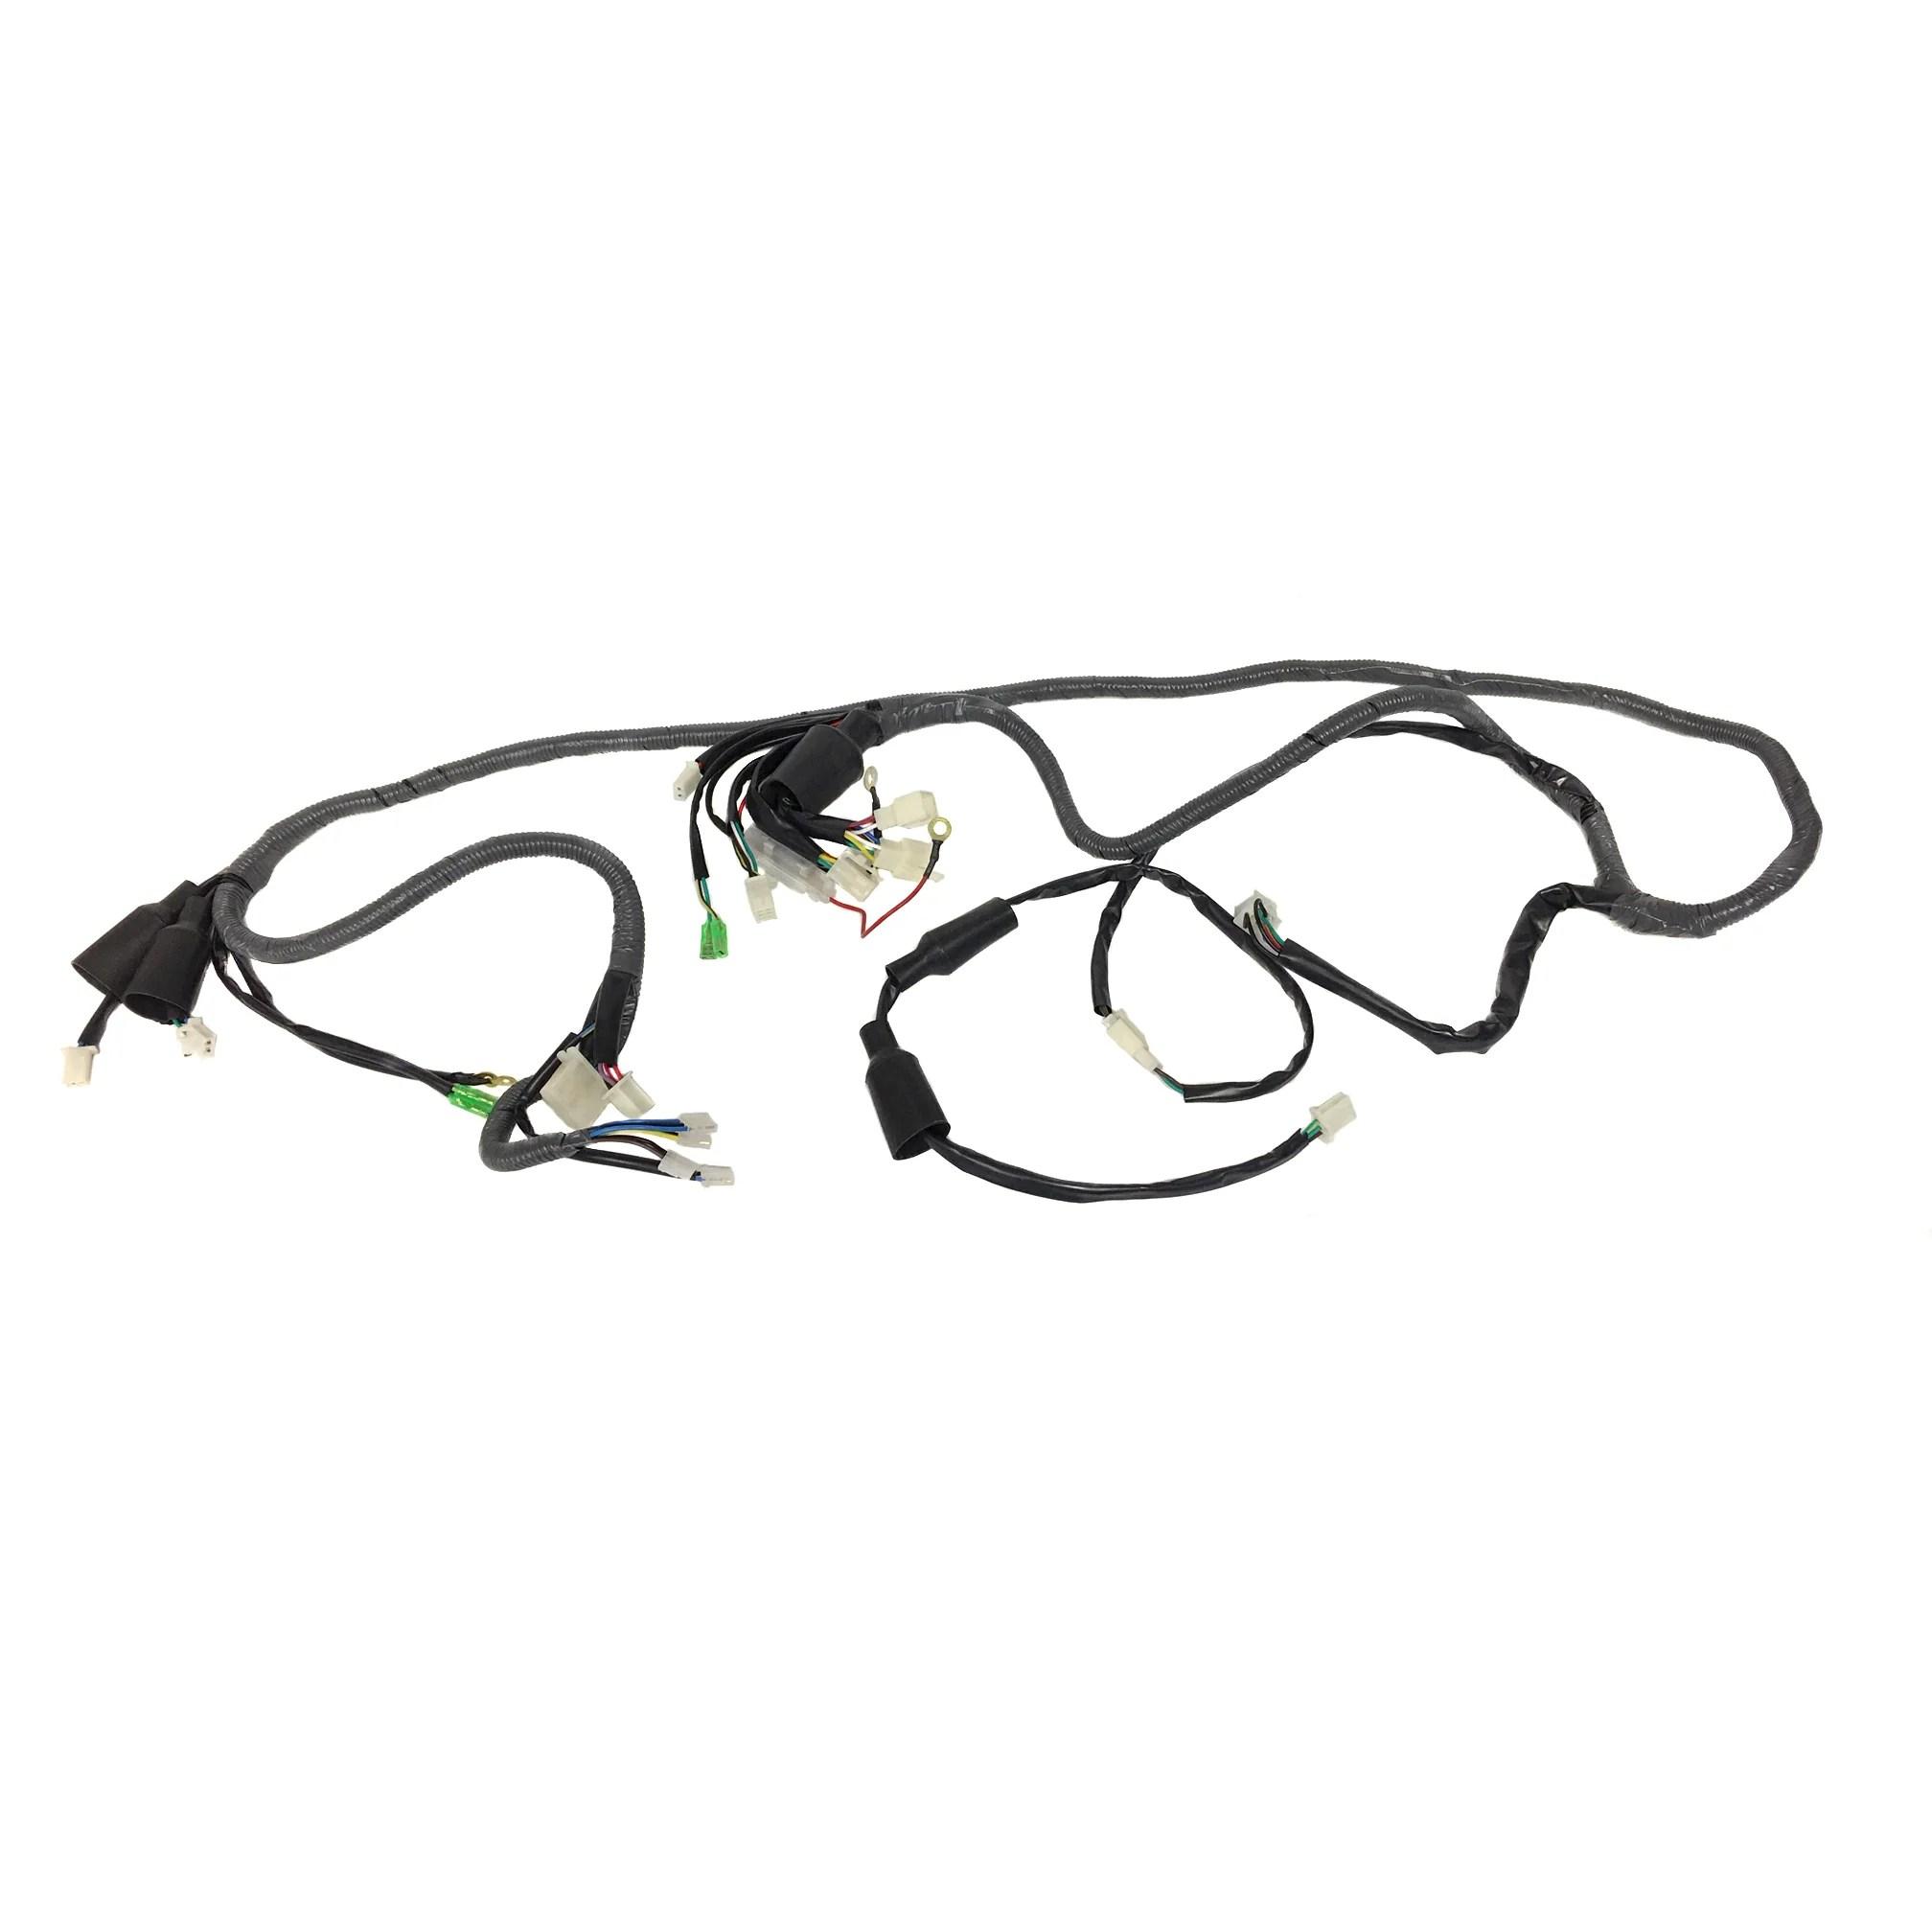 medium resolution of wiring harness for tao tao 110cc gk110 go kart vmc chinese parts